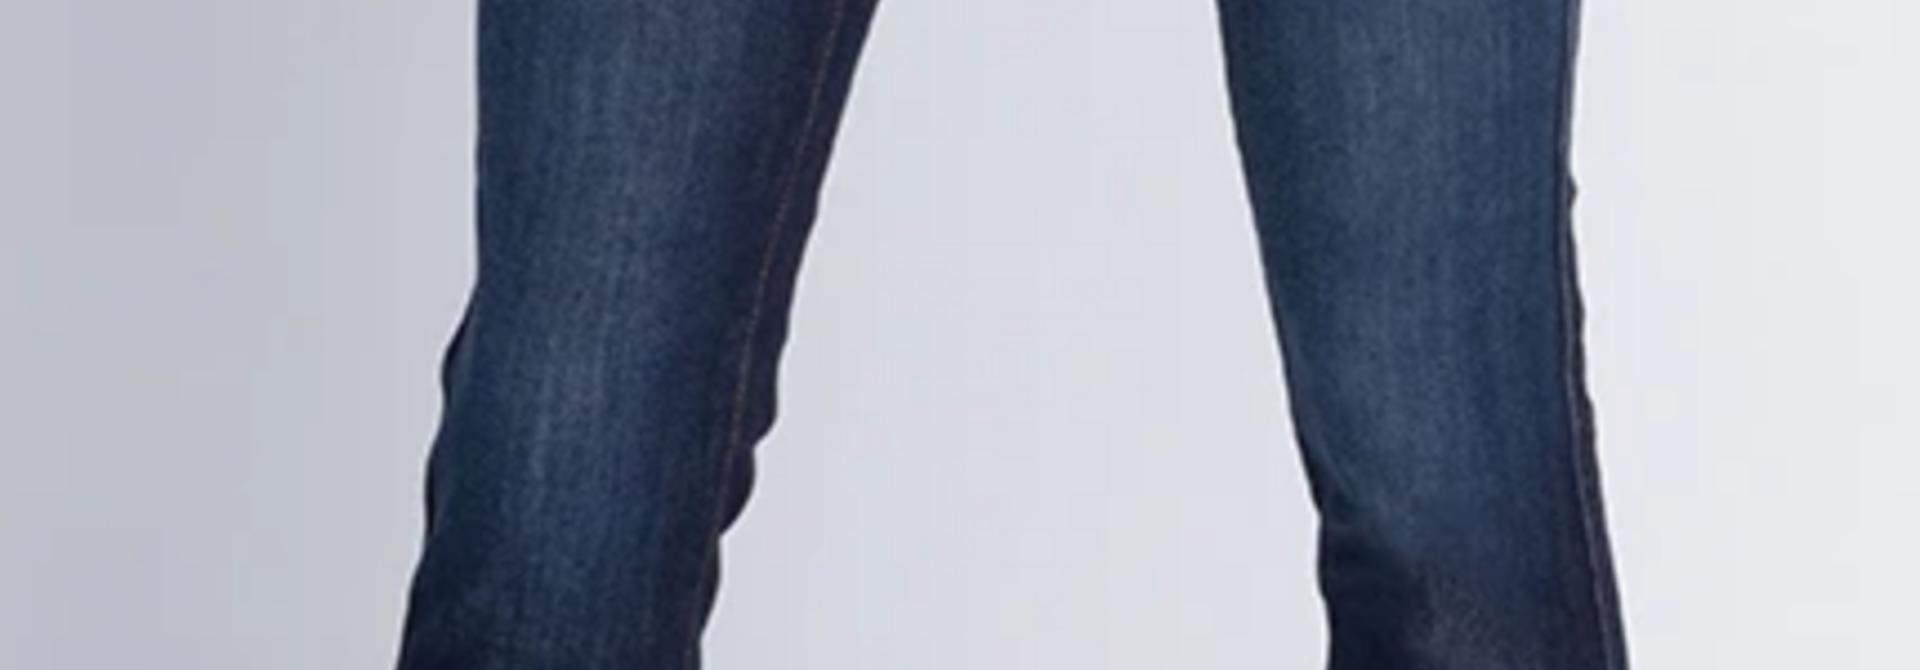 Women's Adaptive Denim High Rise Skinny